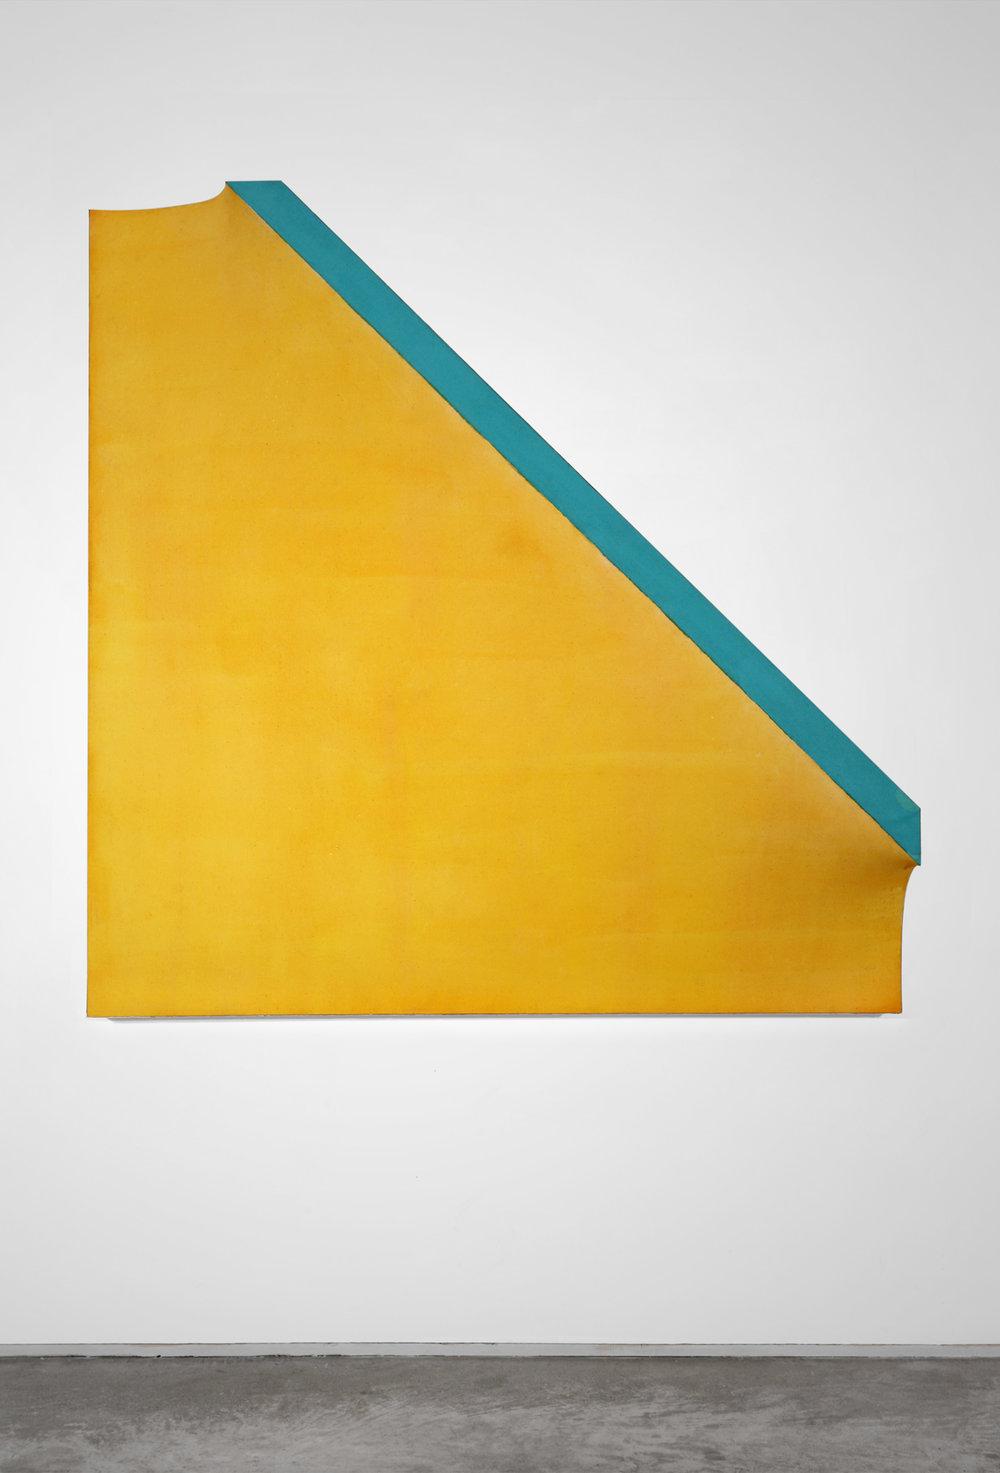 Richard Smith (1931–2016),  A Whole Year a half a day XI , 1966,acrylic on canvas,48 x 48 x 12 in. (121.9 x 121.9 x 30.5 cm)